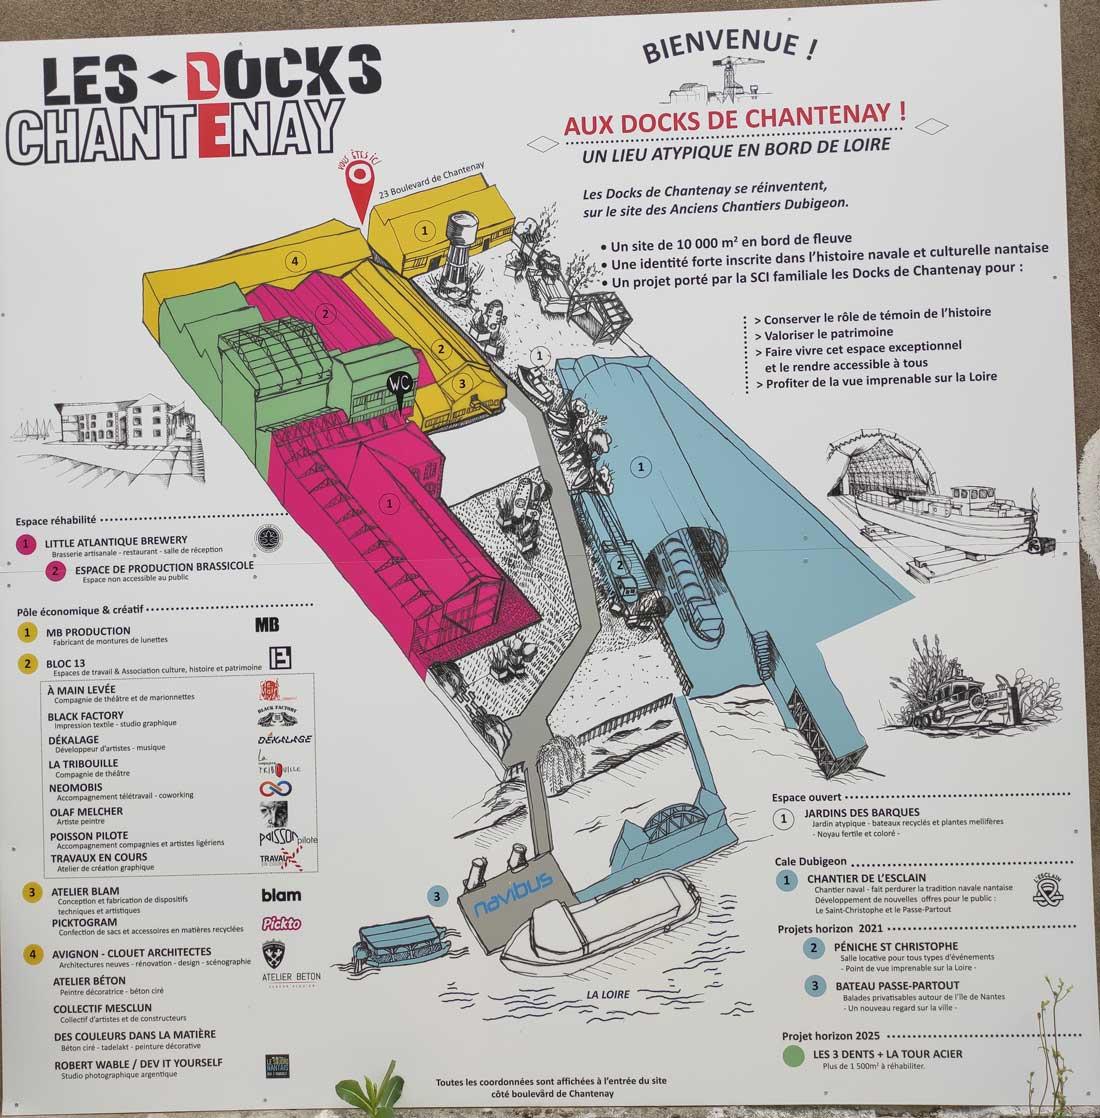 Mapa de Les Docks Chantenay